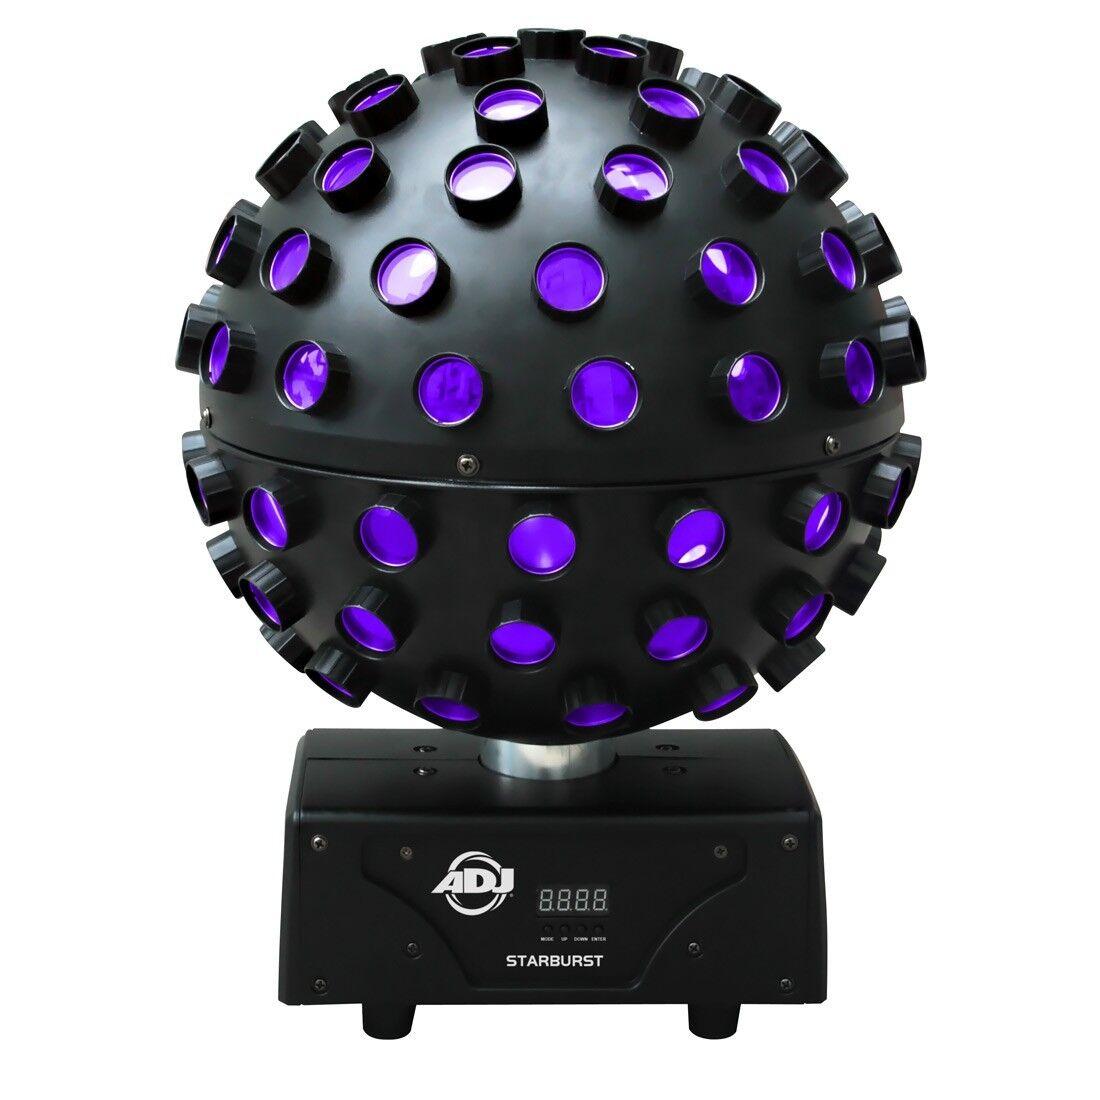 American DJ ADJ Starburst LED RGBWAP Light Effect Mirrorball Revolving 5 x 15W